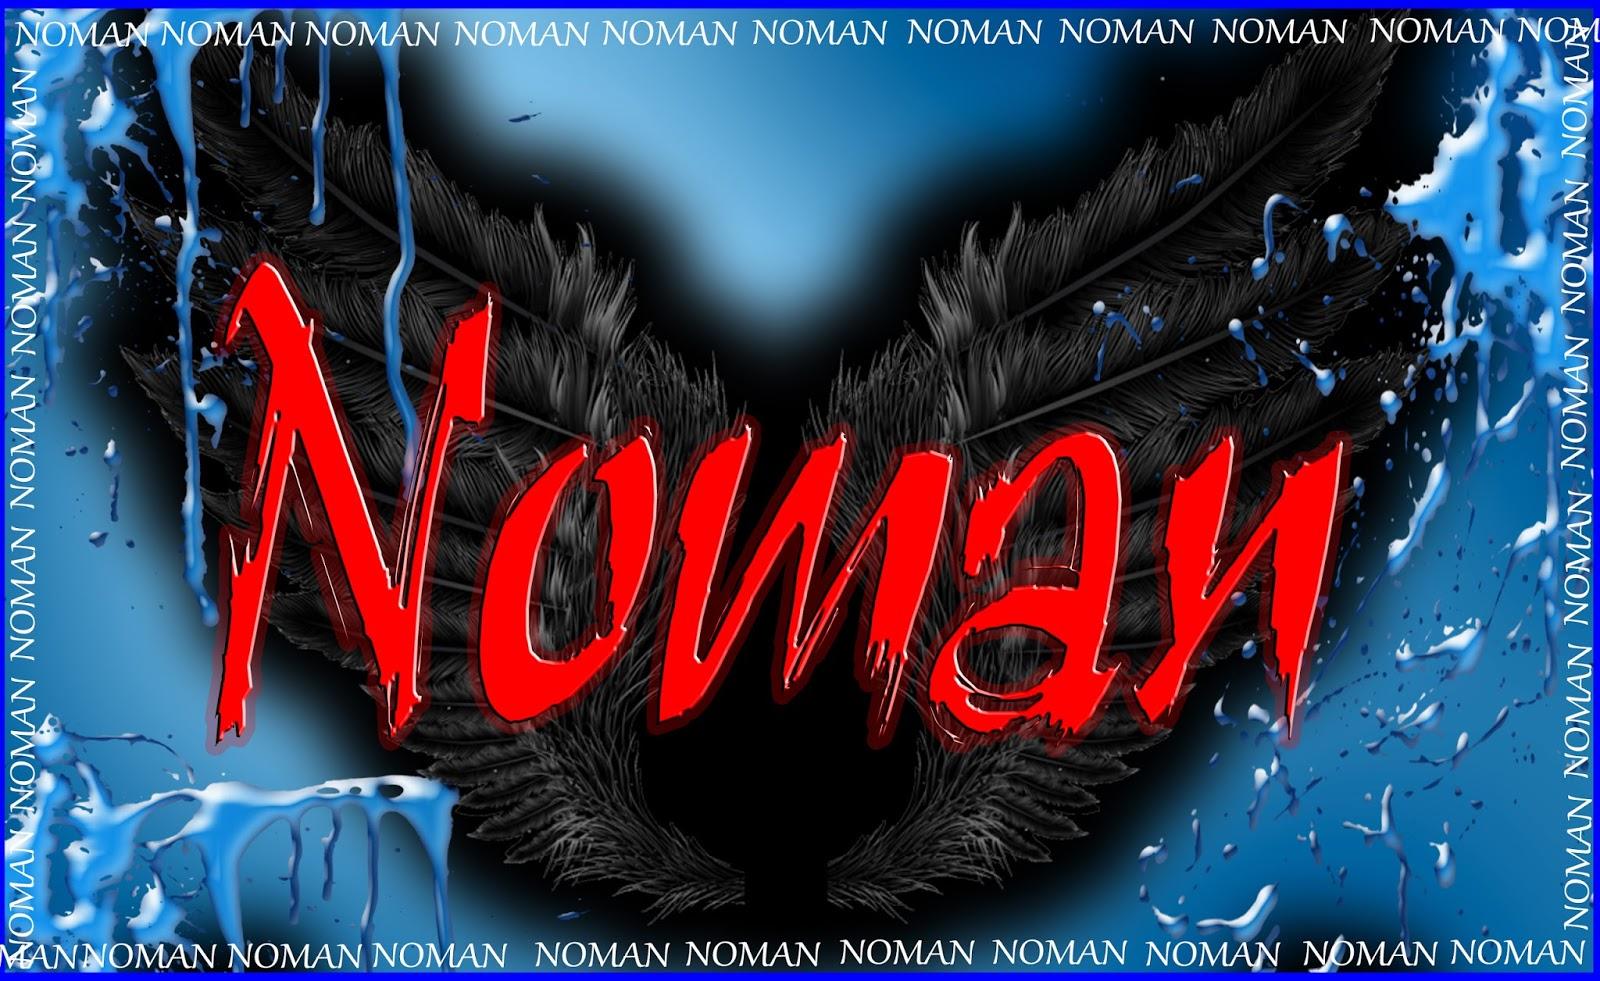 Noman Name Wallpapers HD 2017